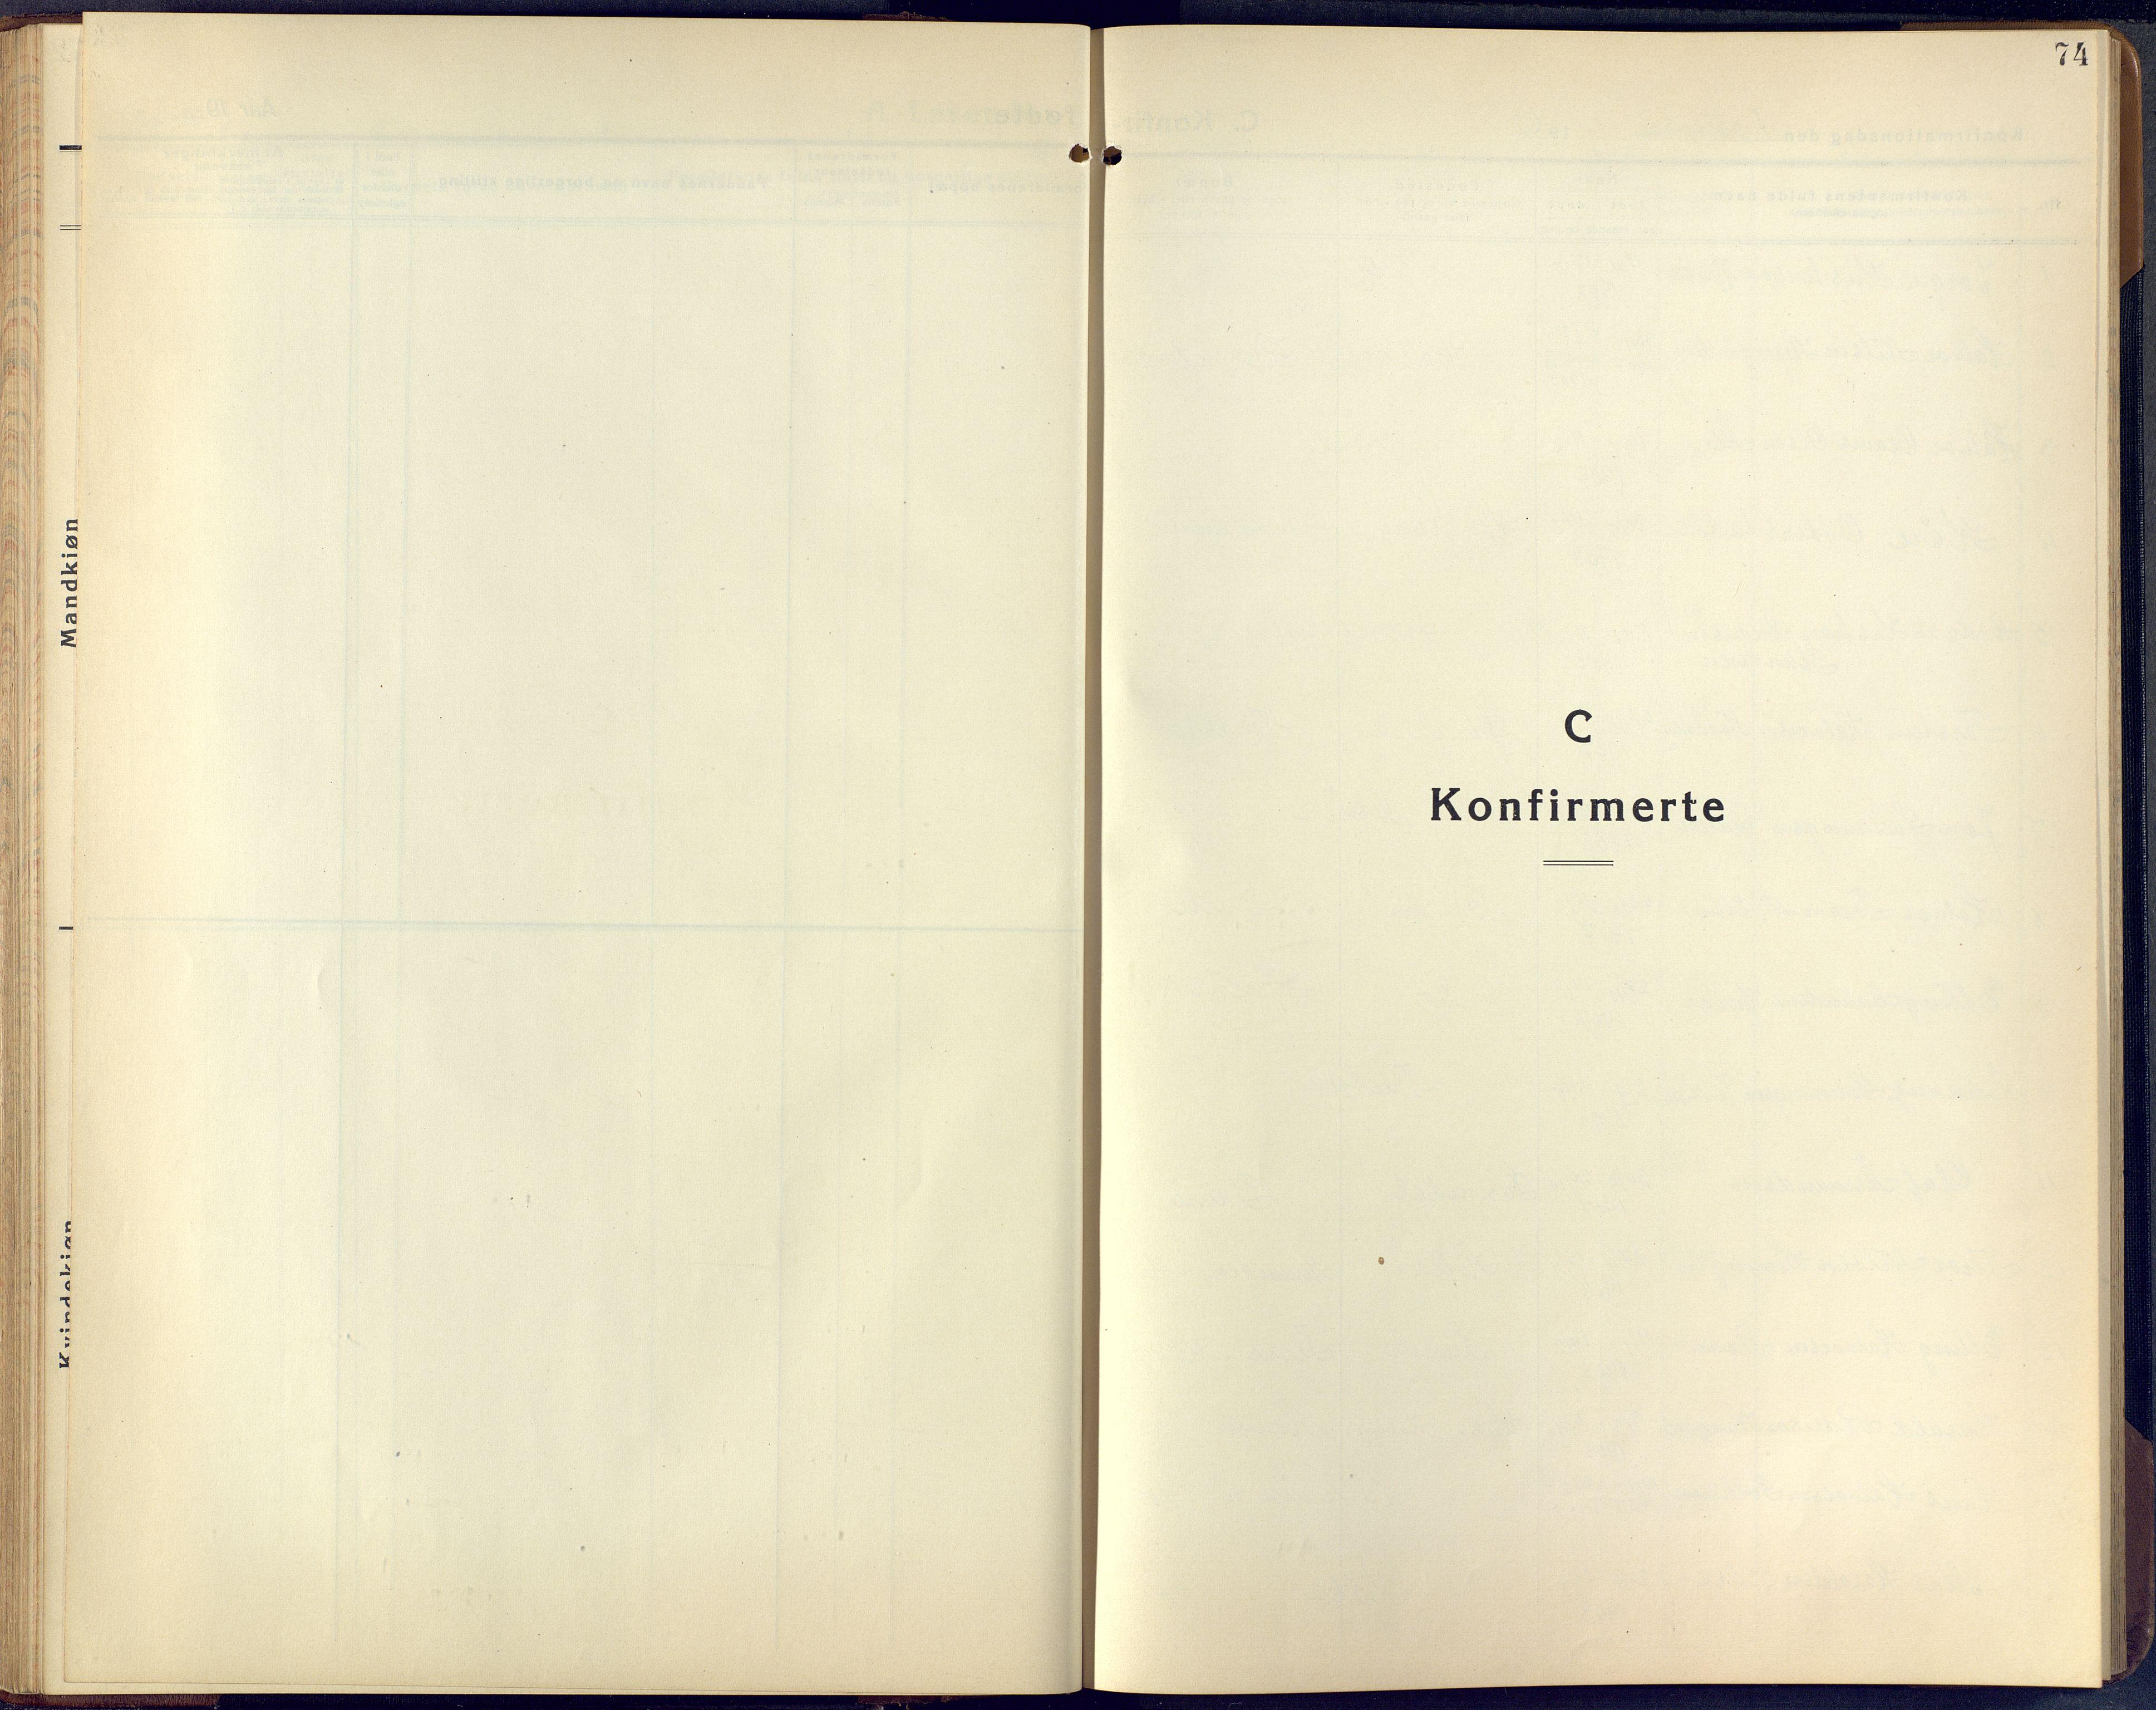 SAKO, Lunde kirkebøker, F/Fa/L0006: Ministerialbok nr. I 6, 1922-1940, s. 74